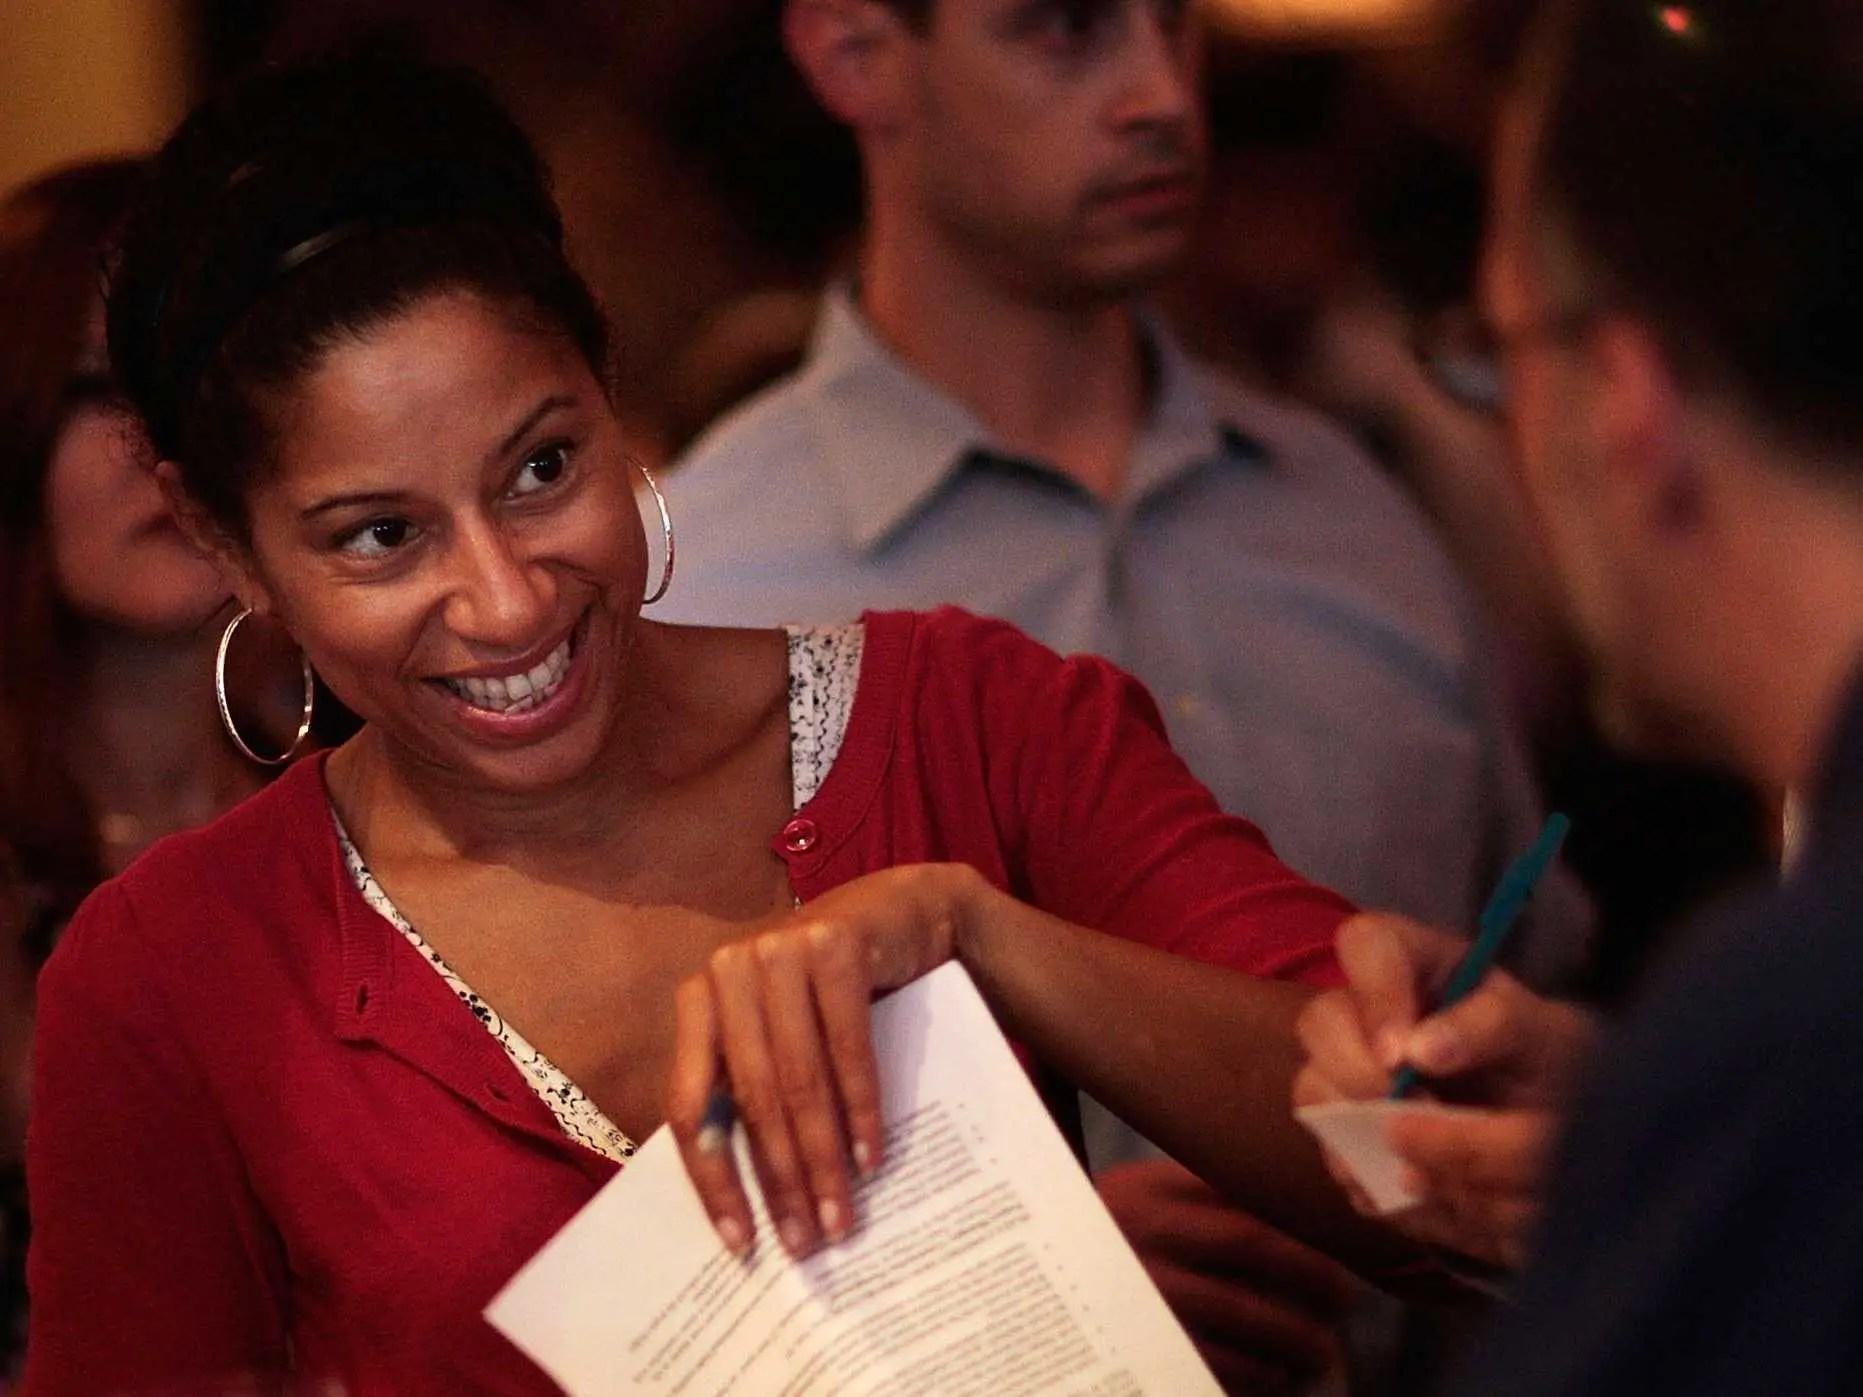 black woman smiling resume job interview